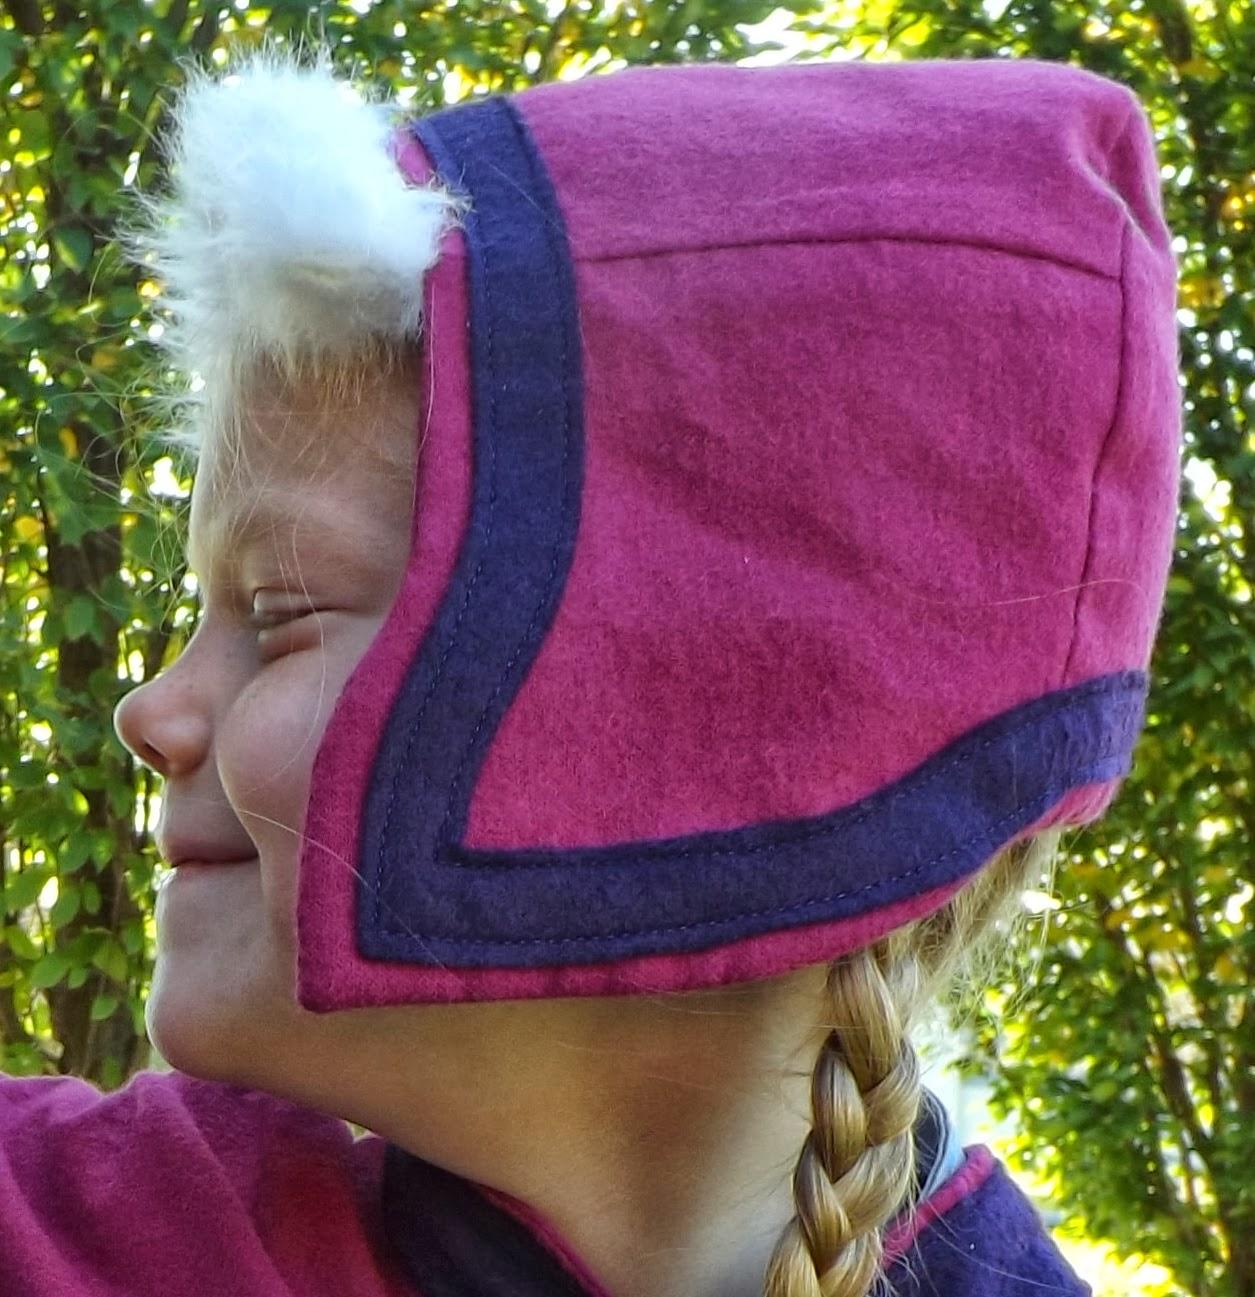 Knitting Pattern For Frozen Hat : Joy 2 Sew: Disneys Princess Anna Pattern Preview